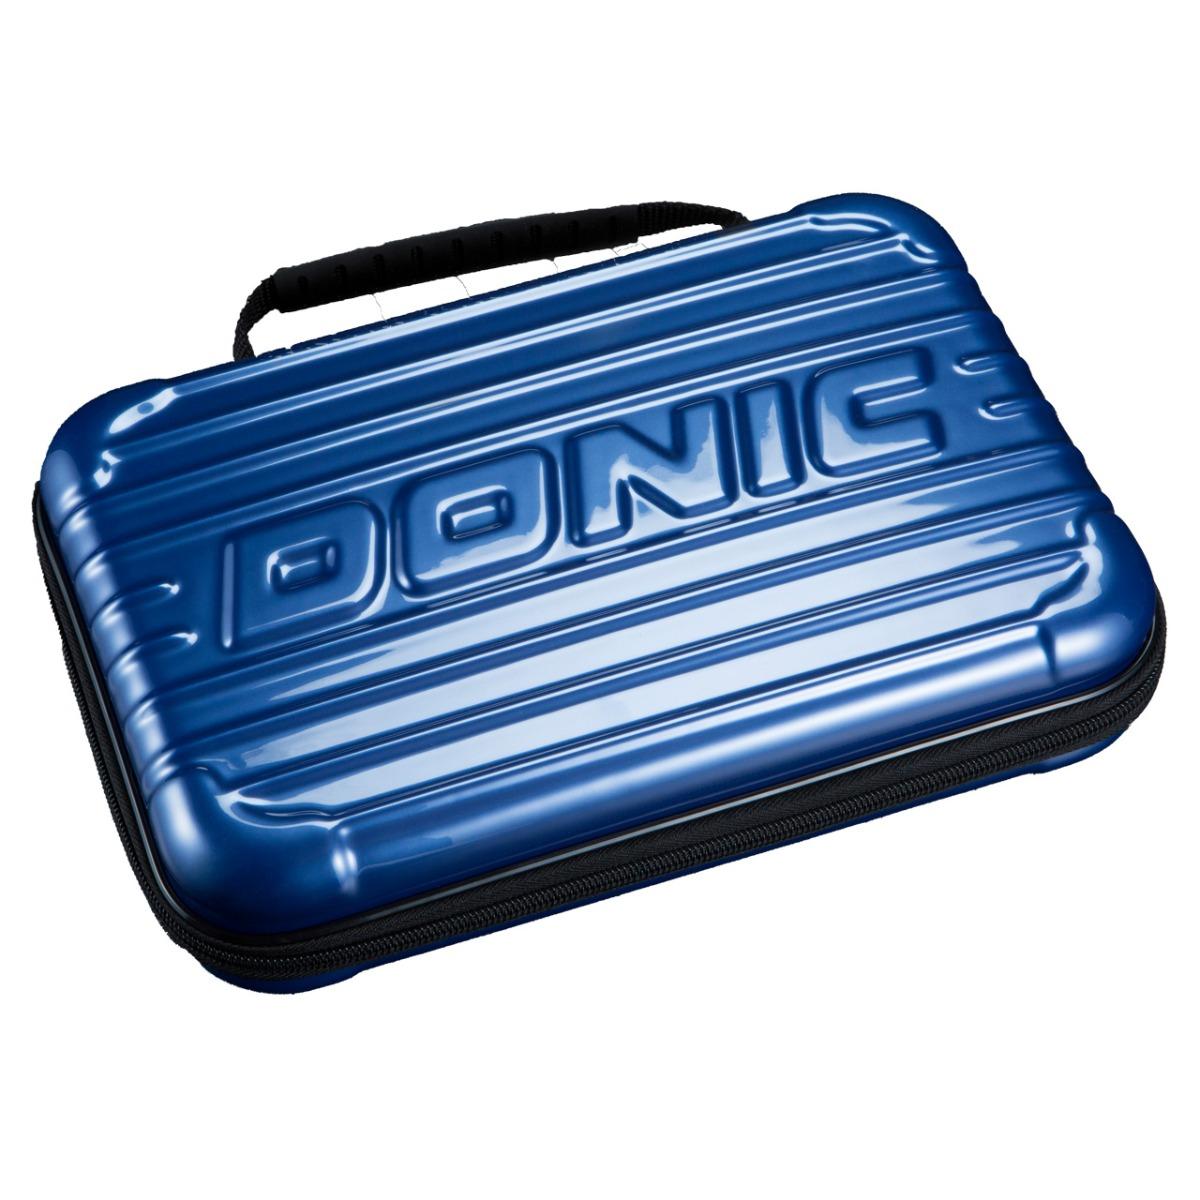 Donic Hard Case Blue